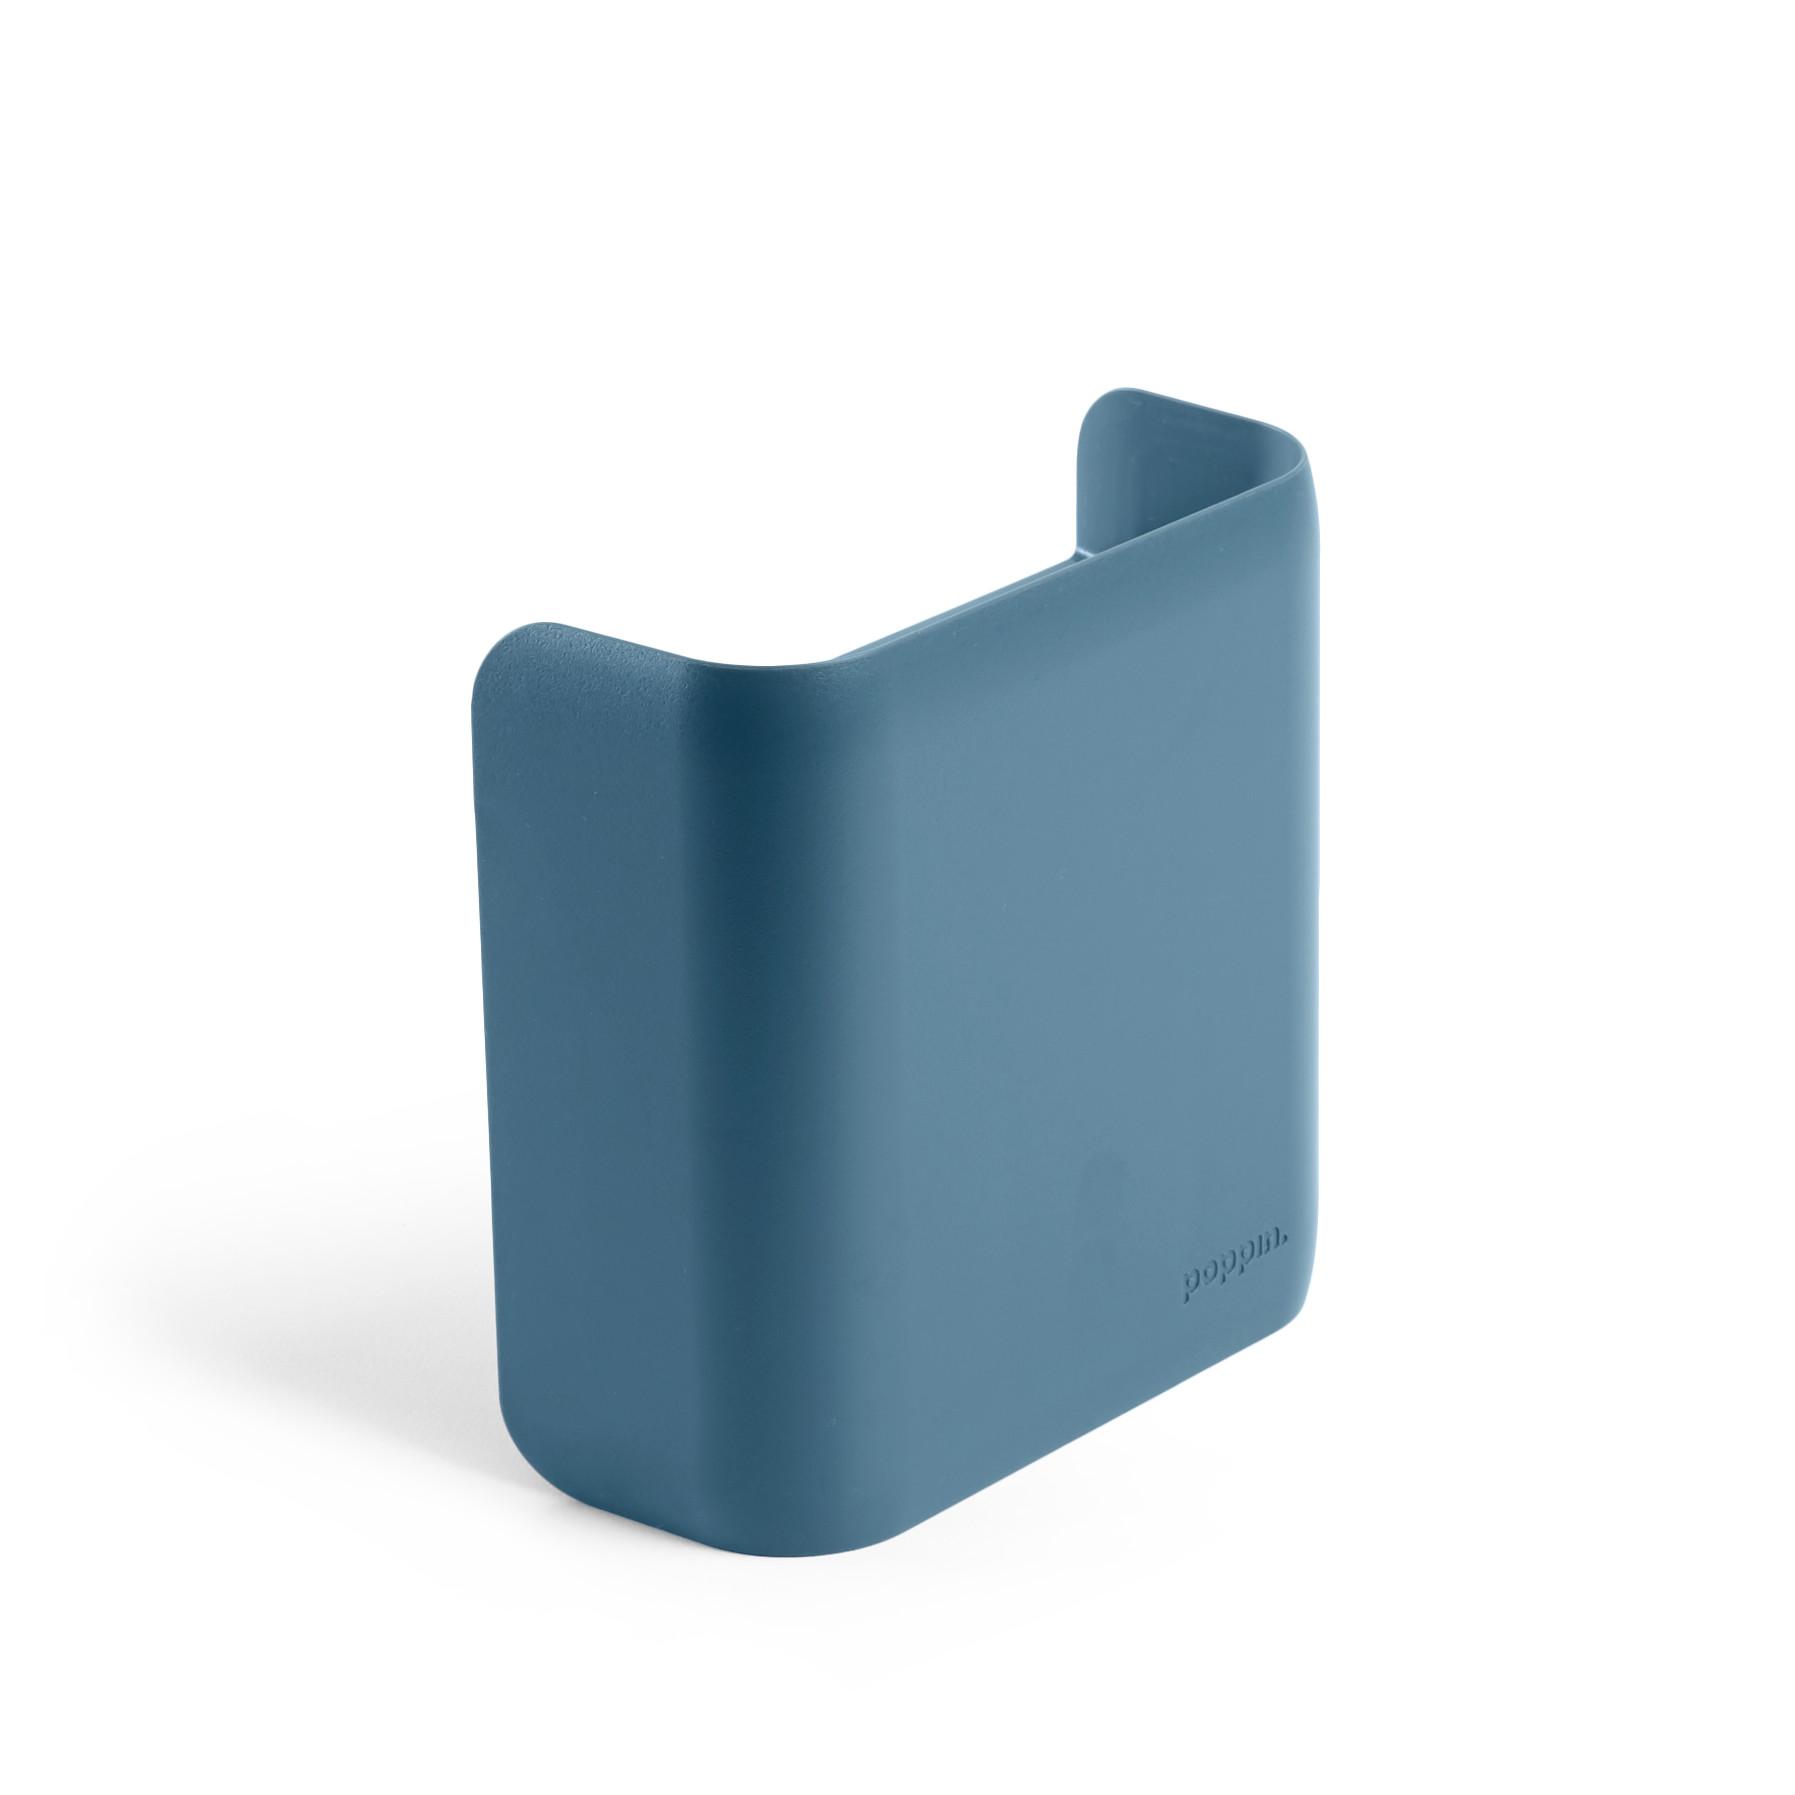 Slate Blue Wall Cup Hi Res